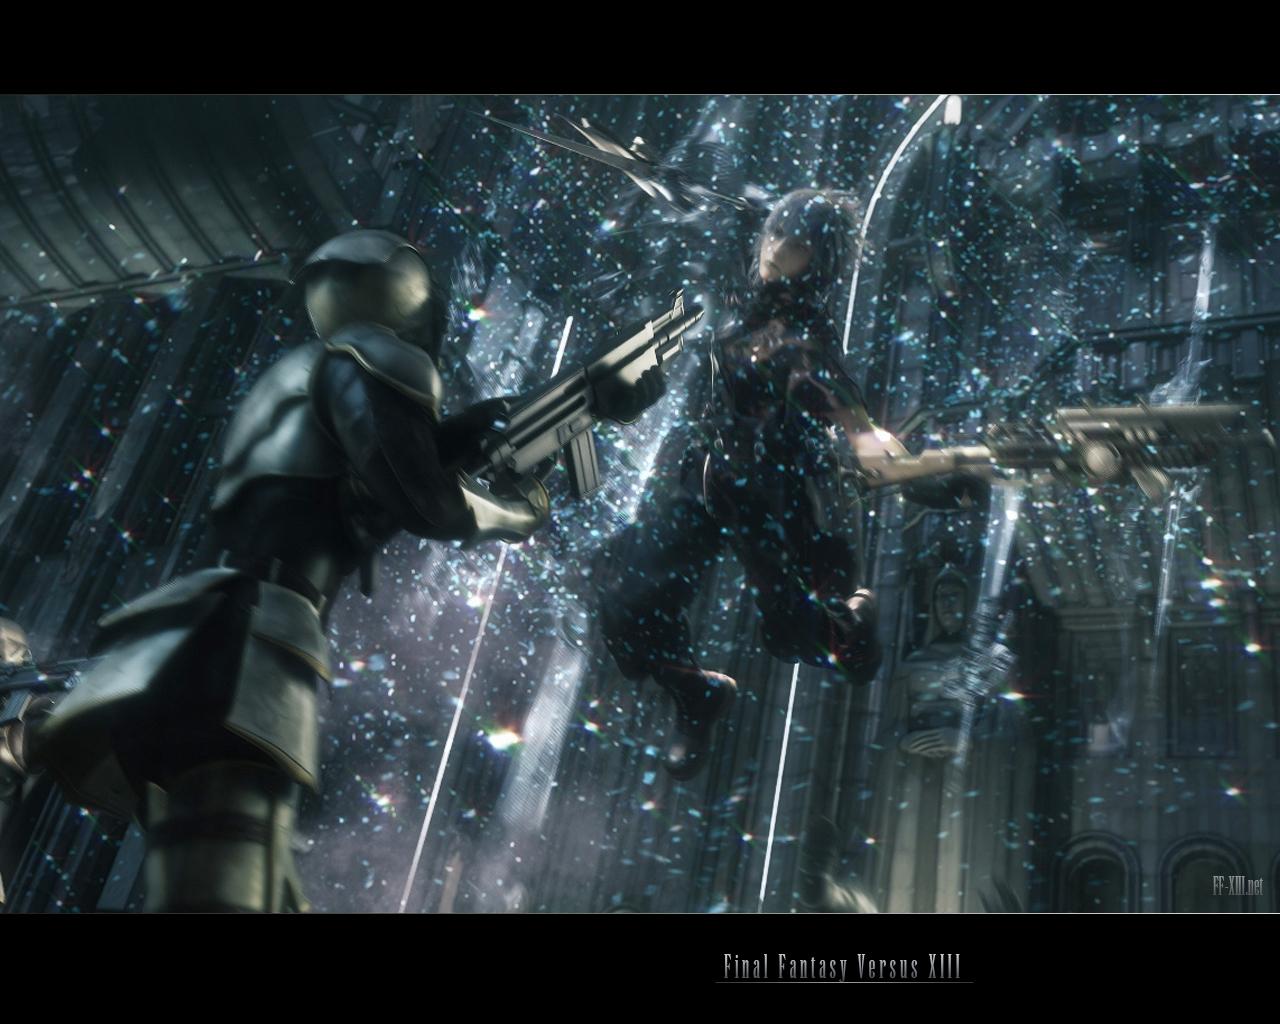 Download Free Final Fantasy Wallpapers 15 Beautiful: Final Fantasy Live Wallpaper